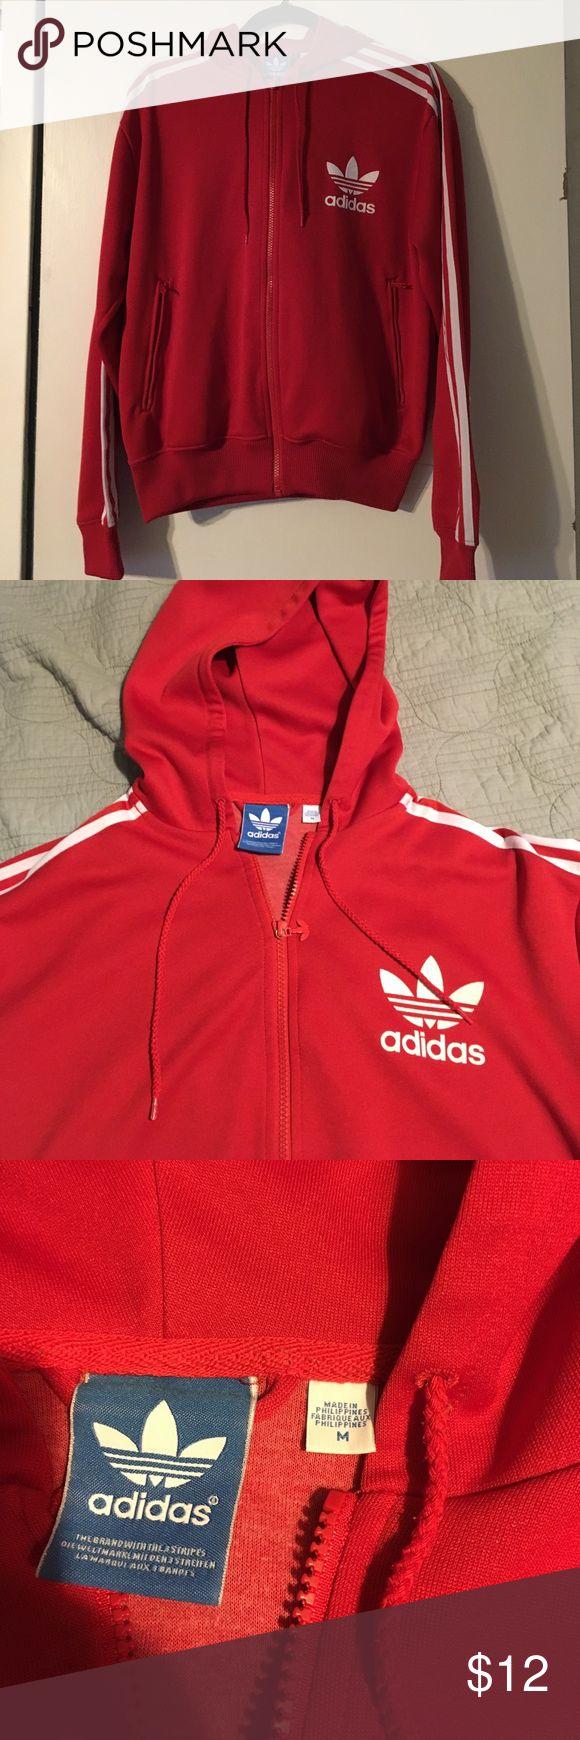 Adidas Zip-up Hoodie Adidas. Medium. Red. Zip-up Hoodie. Excellent condition. Smoke free home. Adidas Tops Sweatshirts & Hoodies